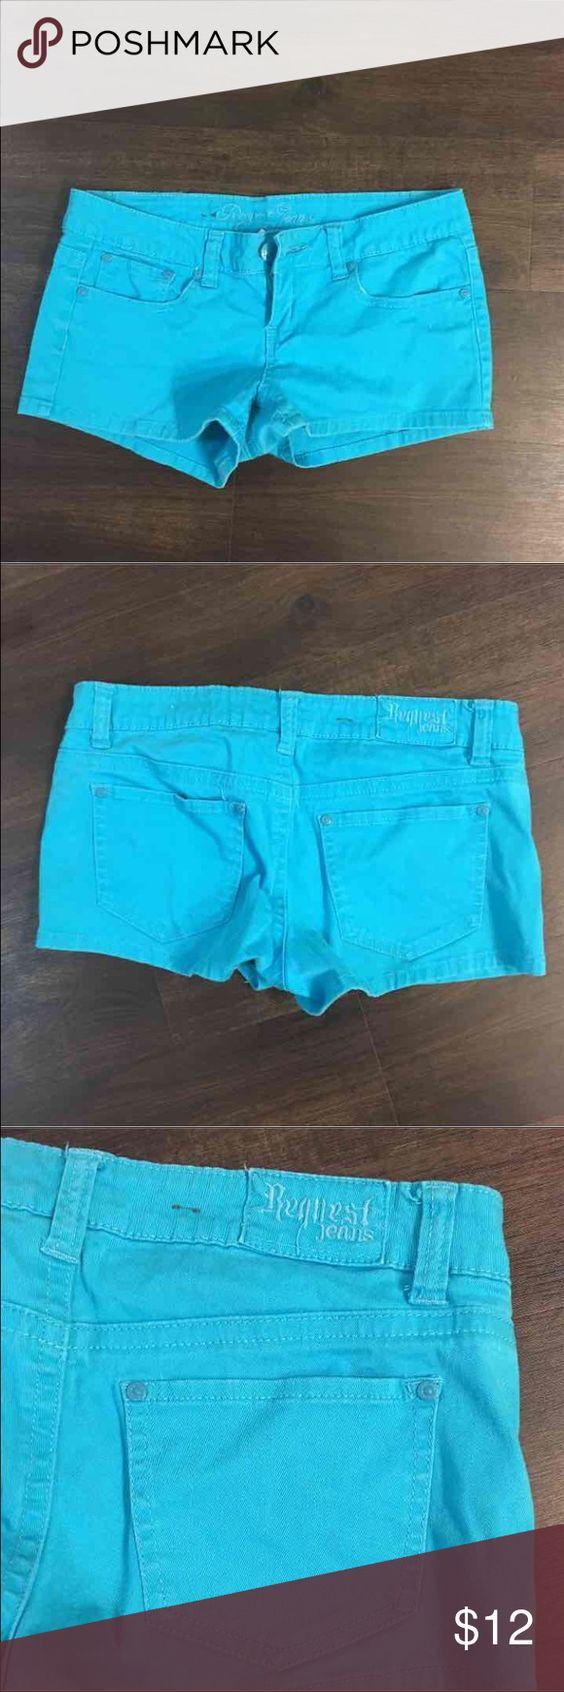 Turquoise Shorts Good condition Size 9 Shorts